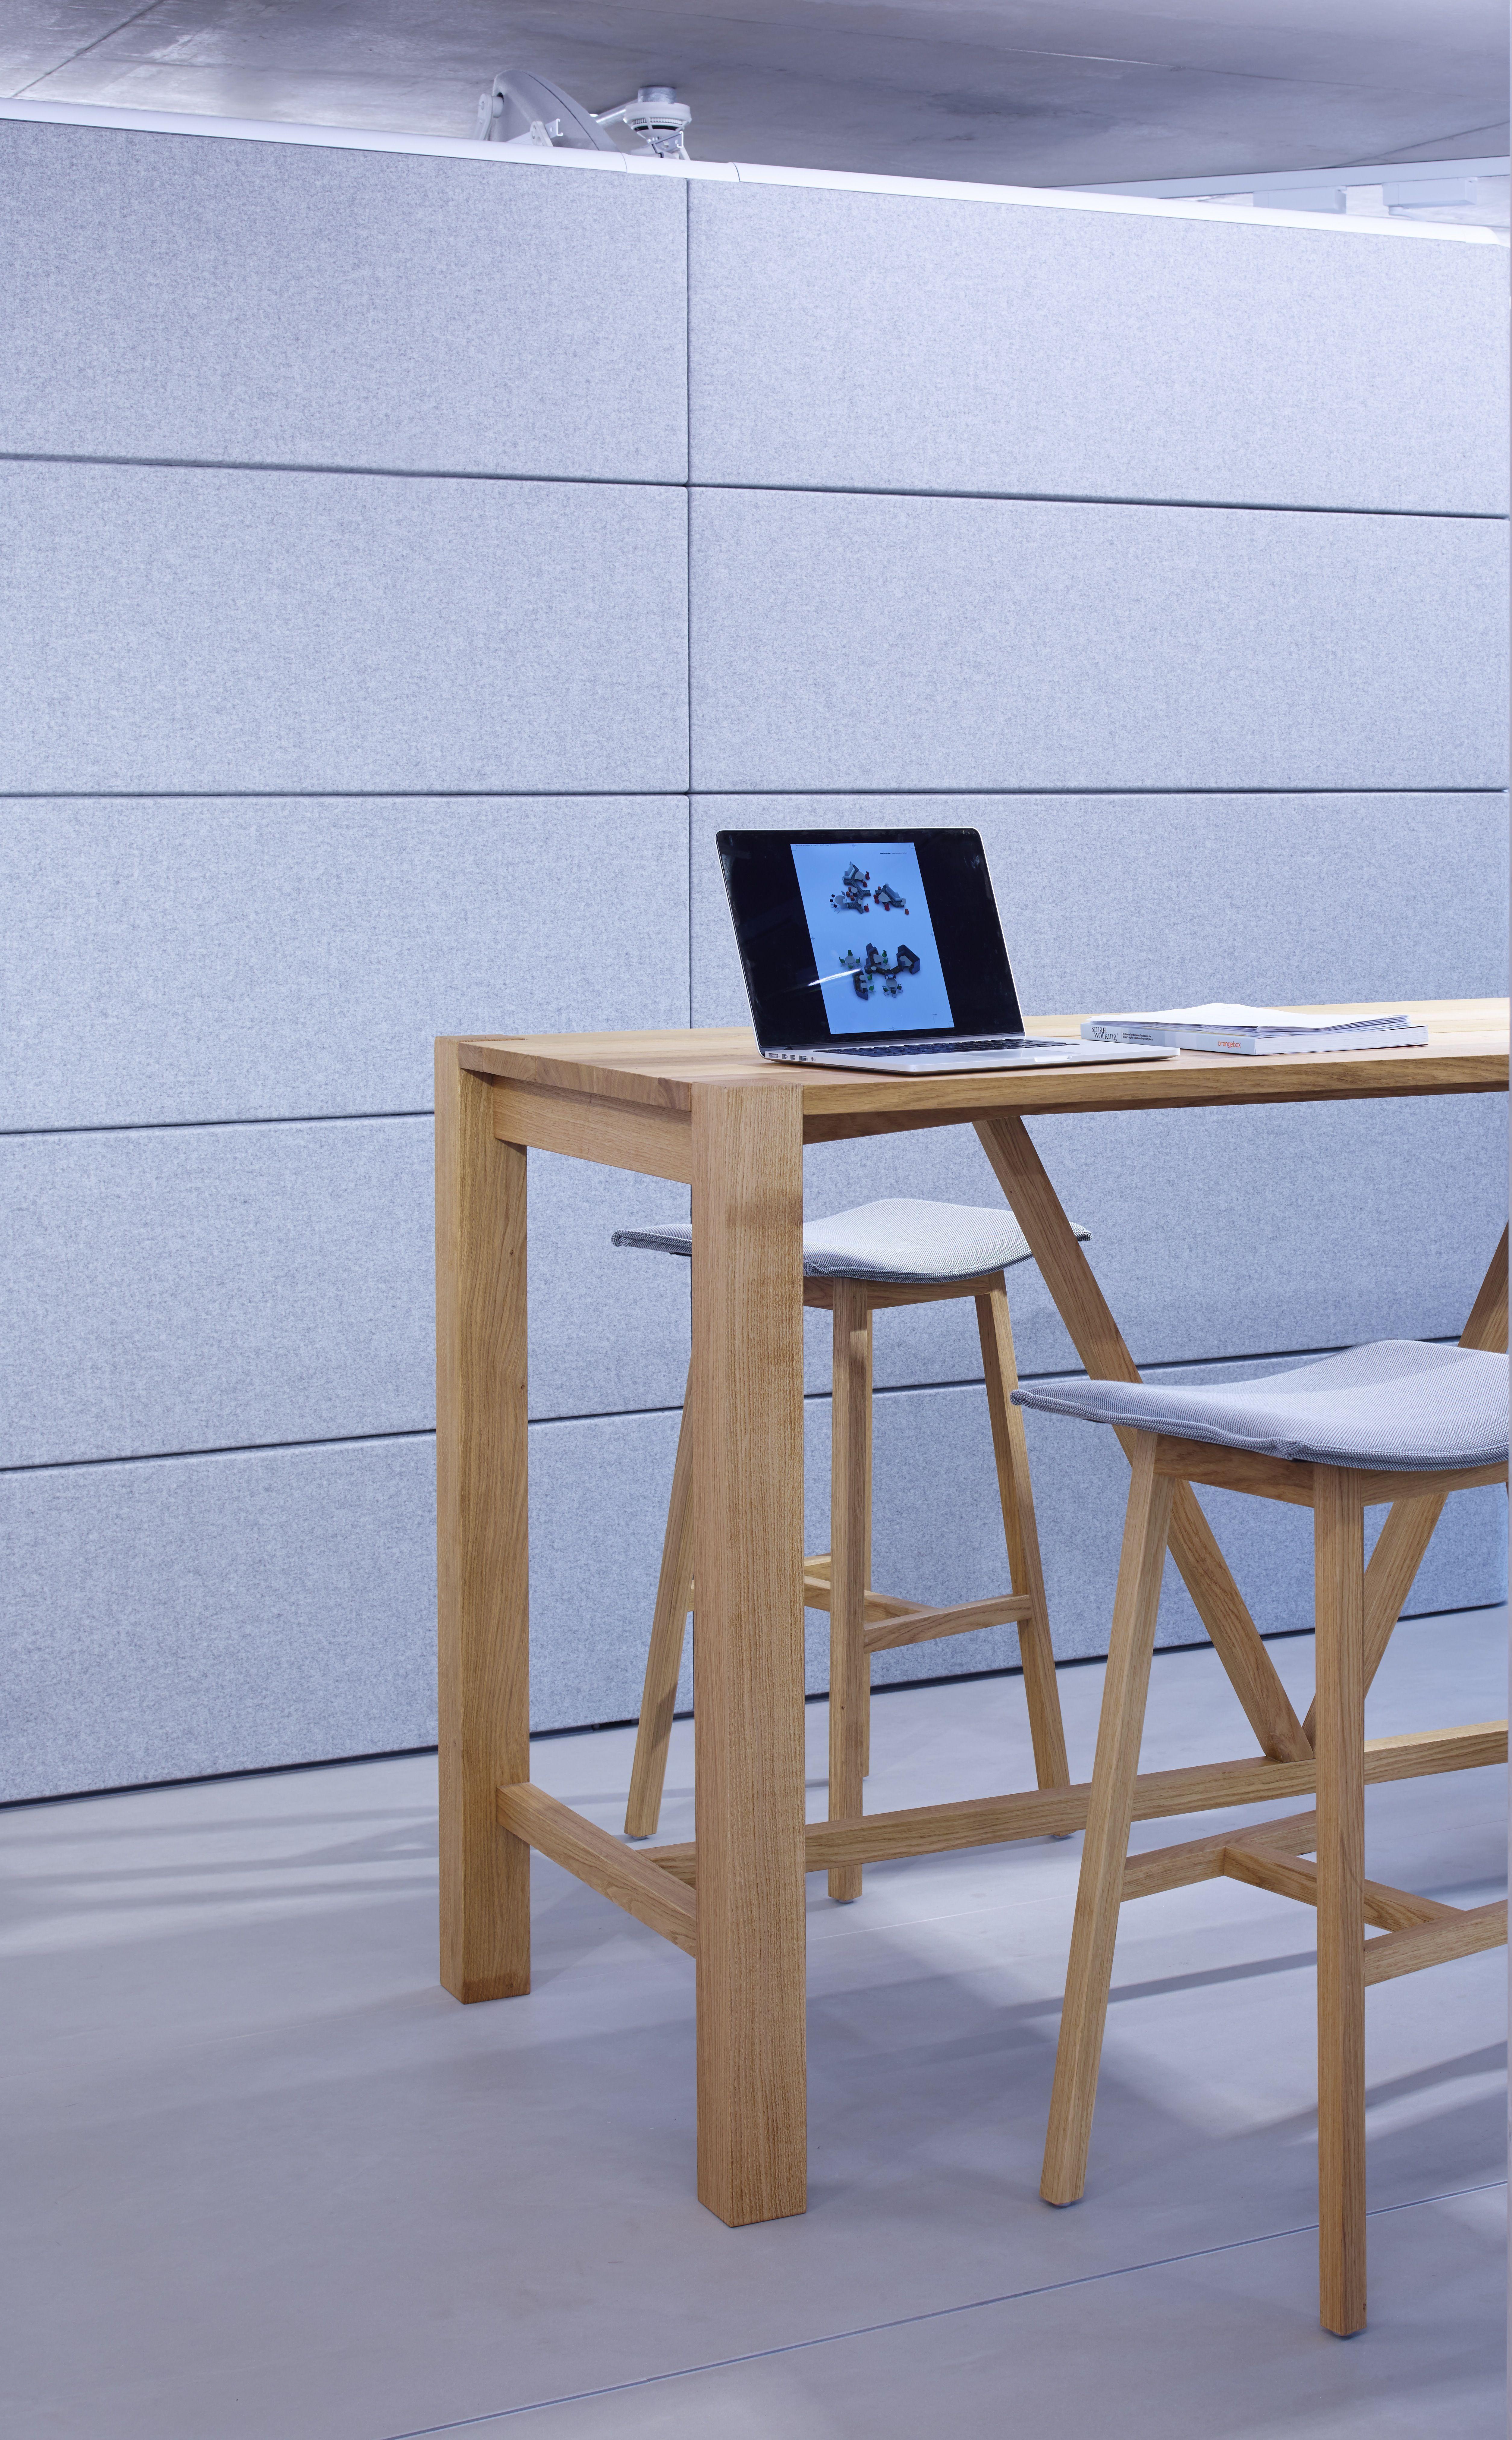 Orange box Smartworking in London is an office furniture showroom